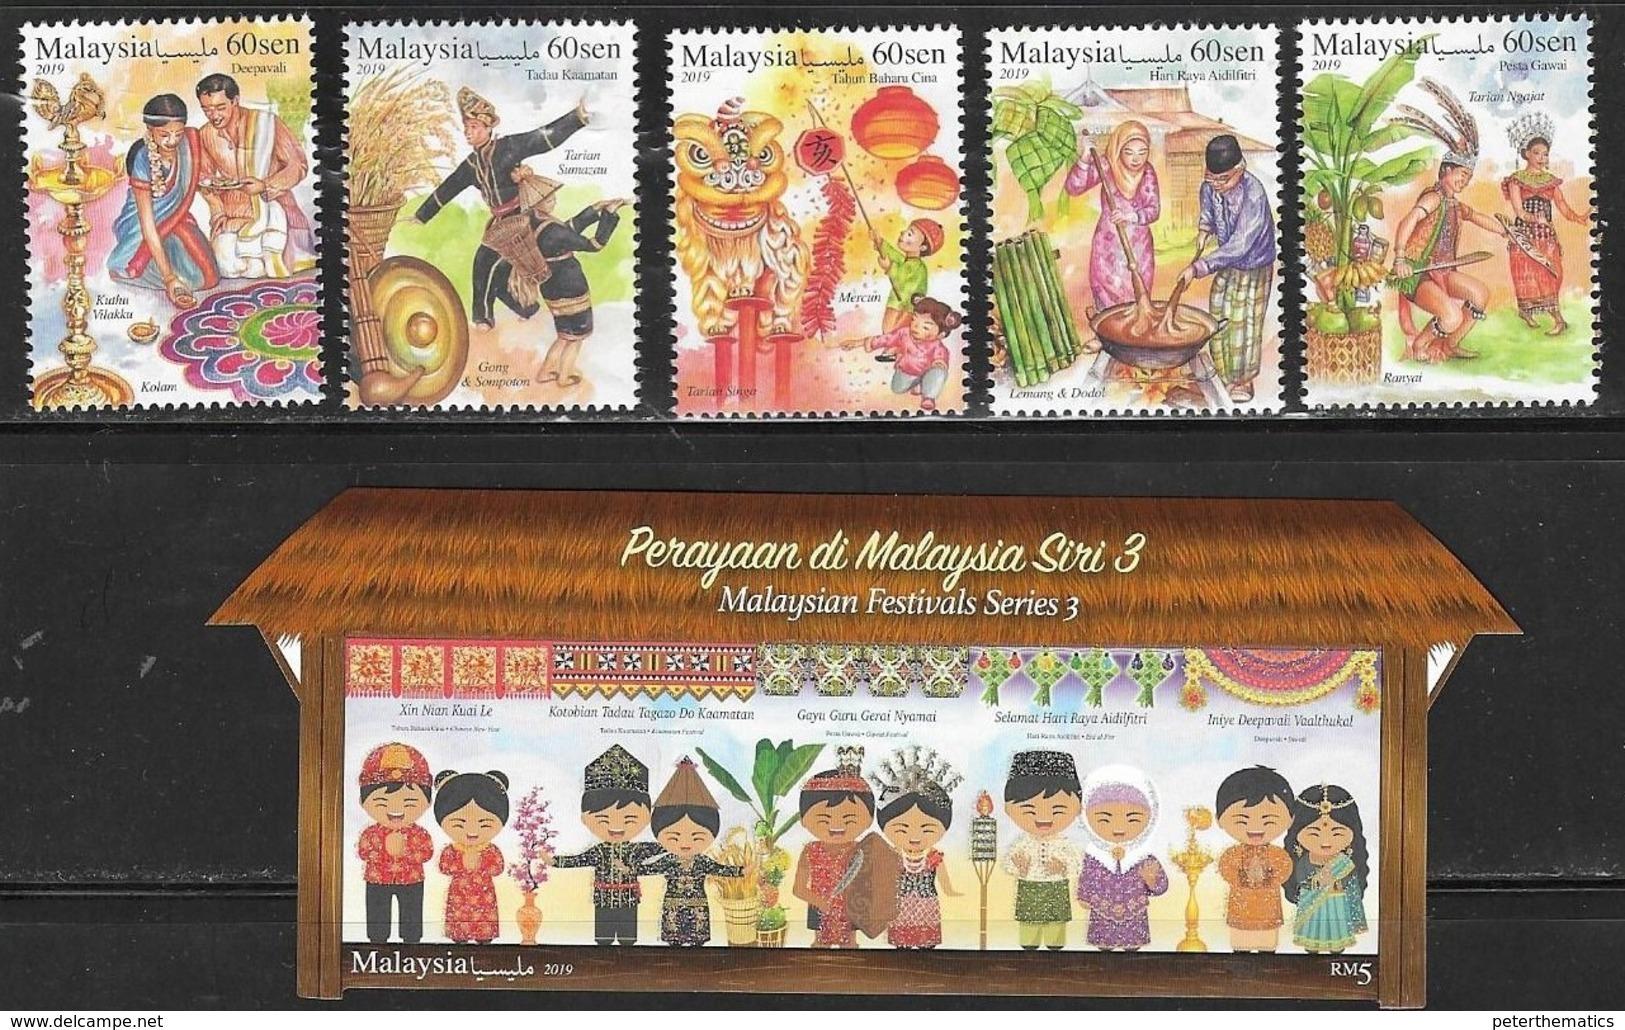 MALAYSIA, 2019, MNH, FESTIVALS, CULTURES, COSTUMES, FRUIT, GRAIN, LANTERNS, DRAGONS, 5v+GLITTER-COATED S/SHEET - Celebrations